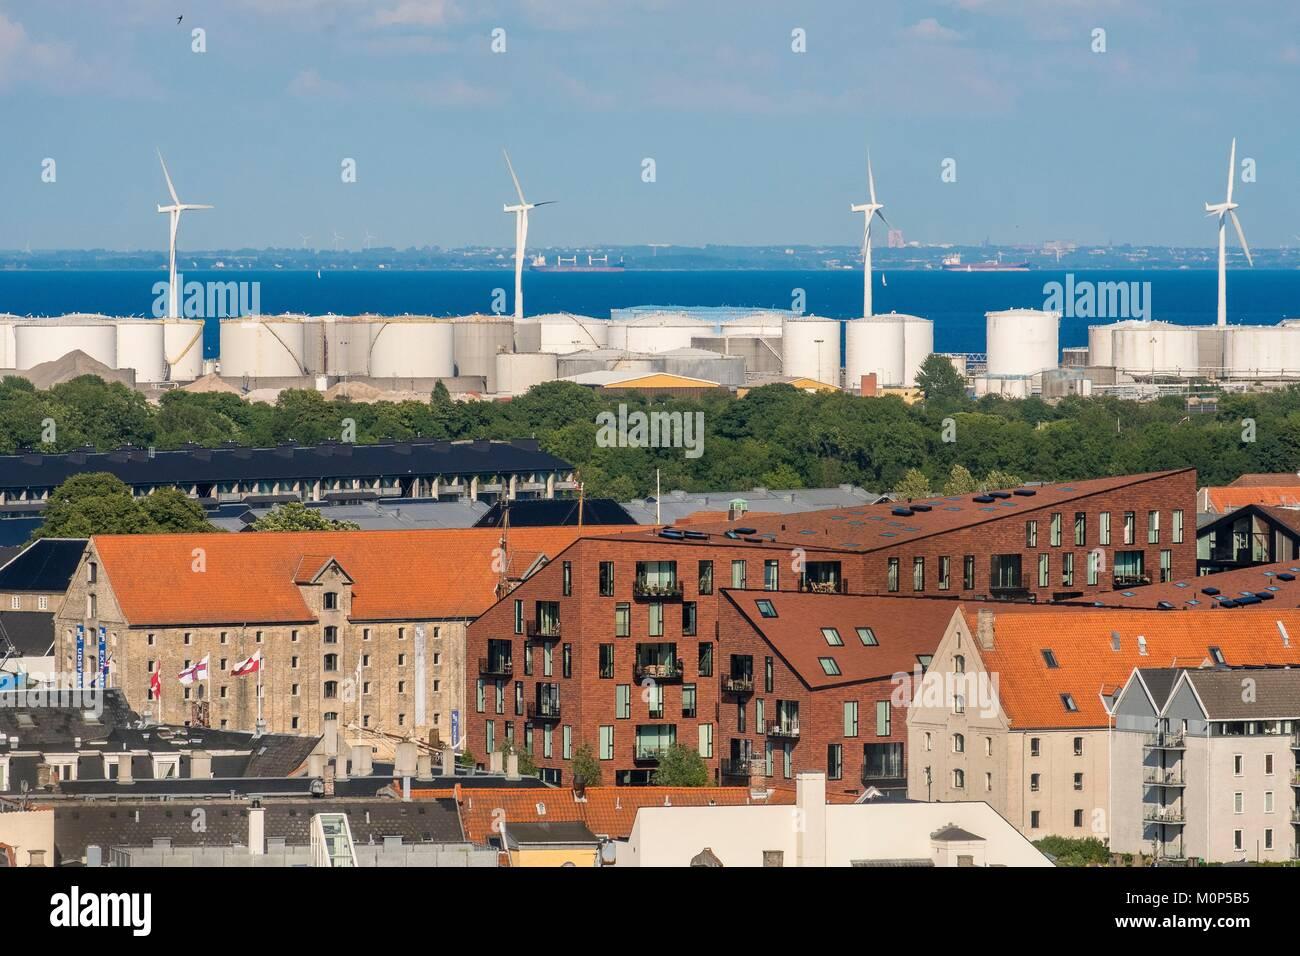 Denmark,Zealand,Copenhagen,warehouses and storage tank - Stock Image